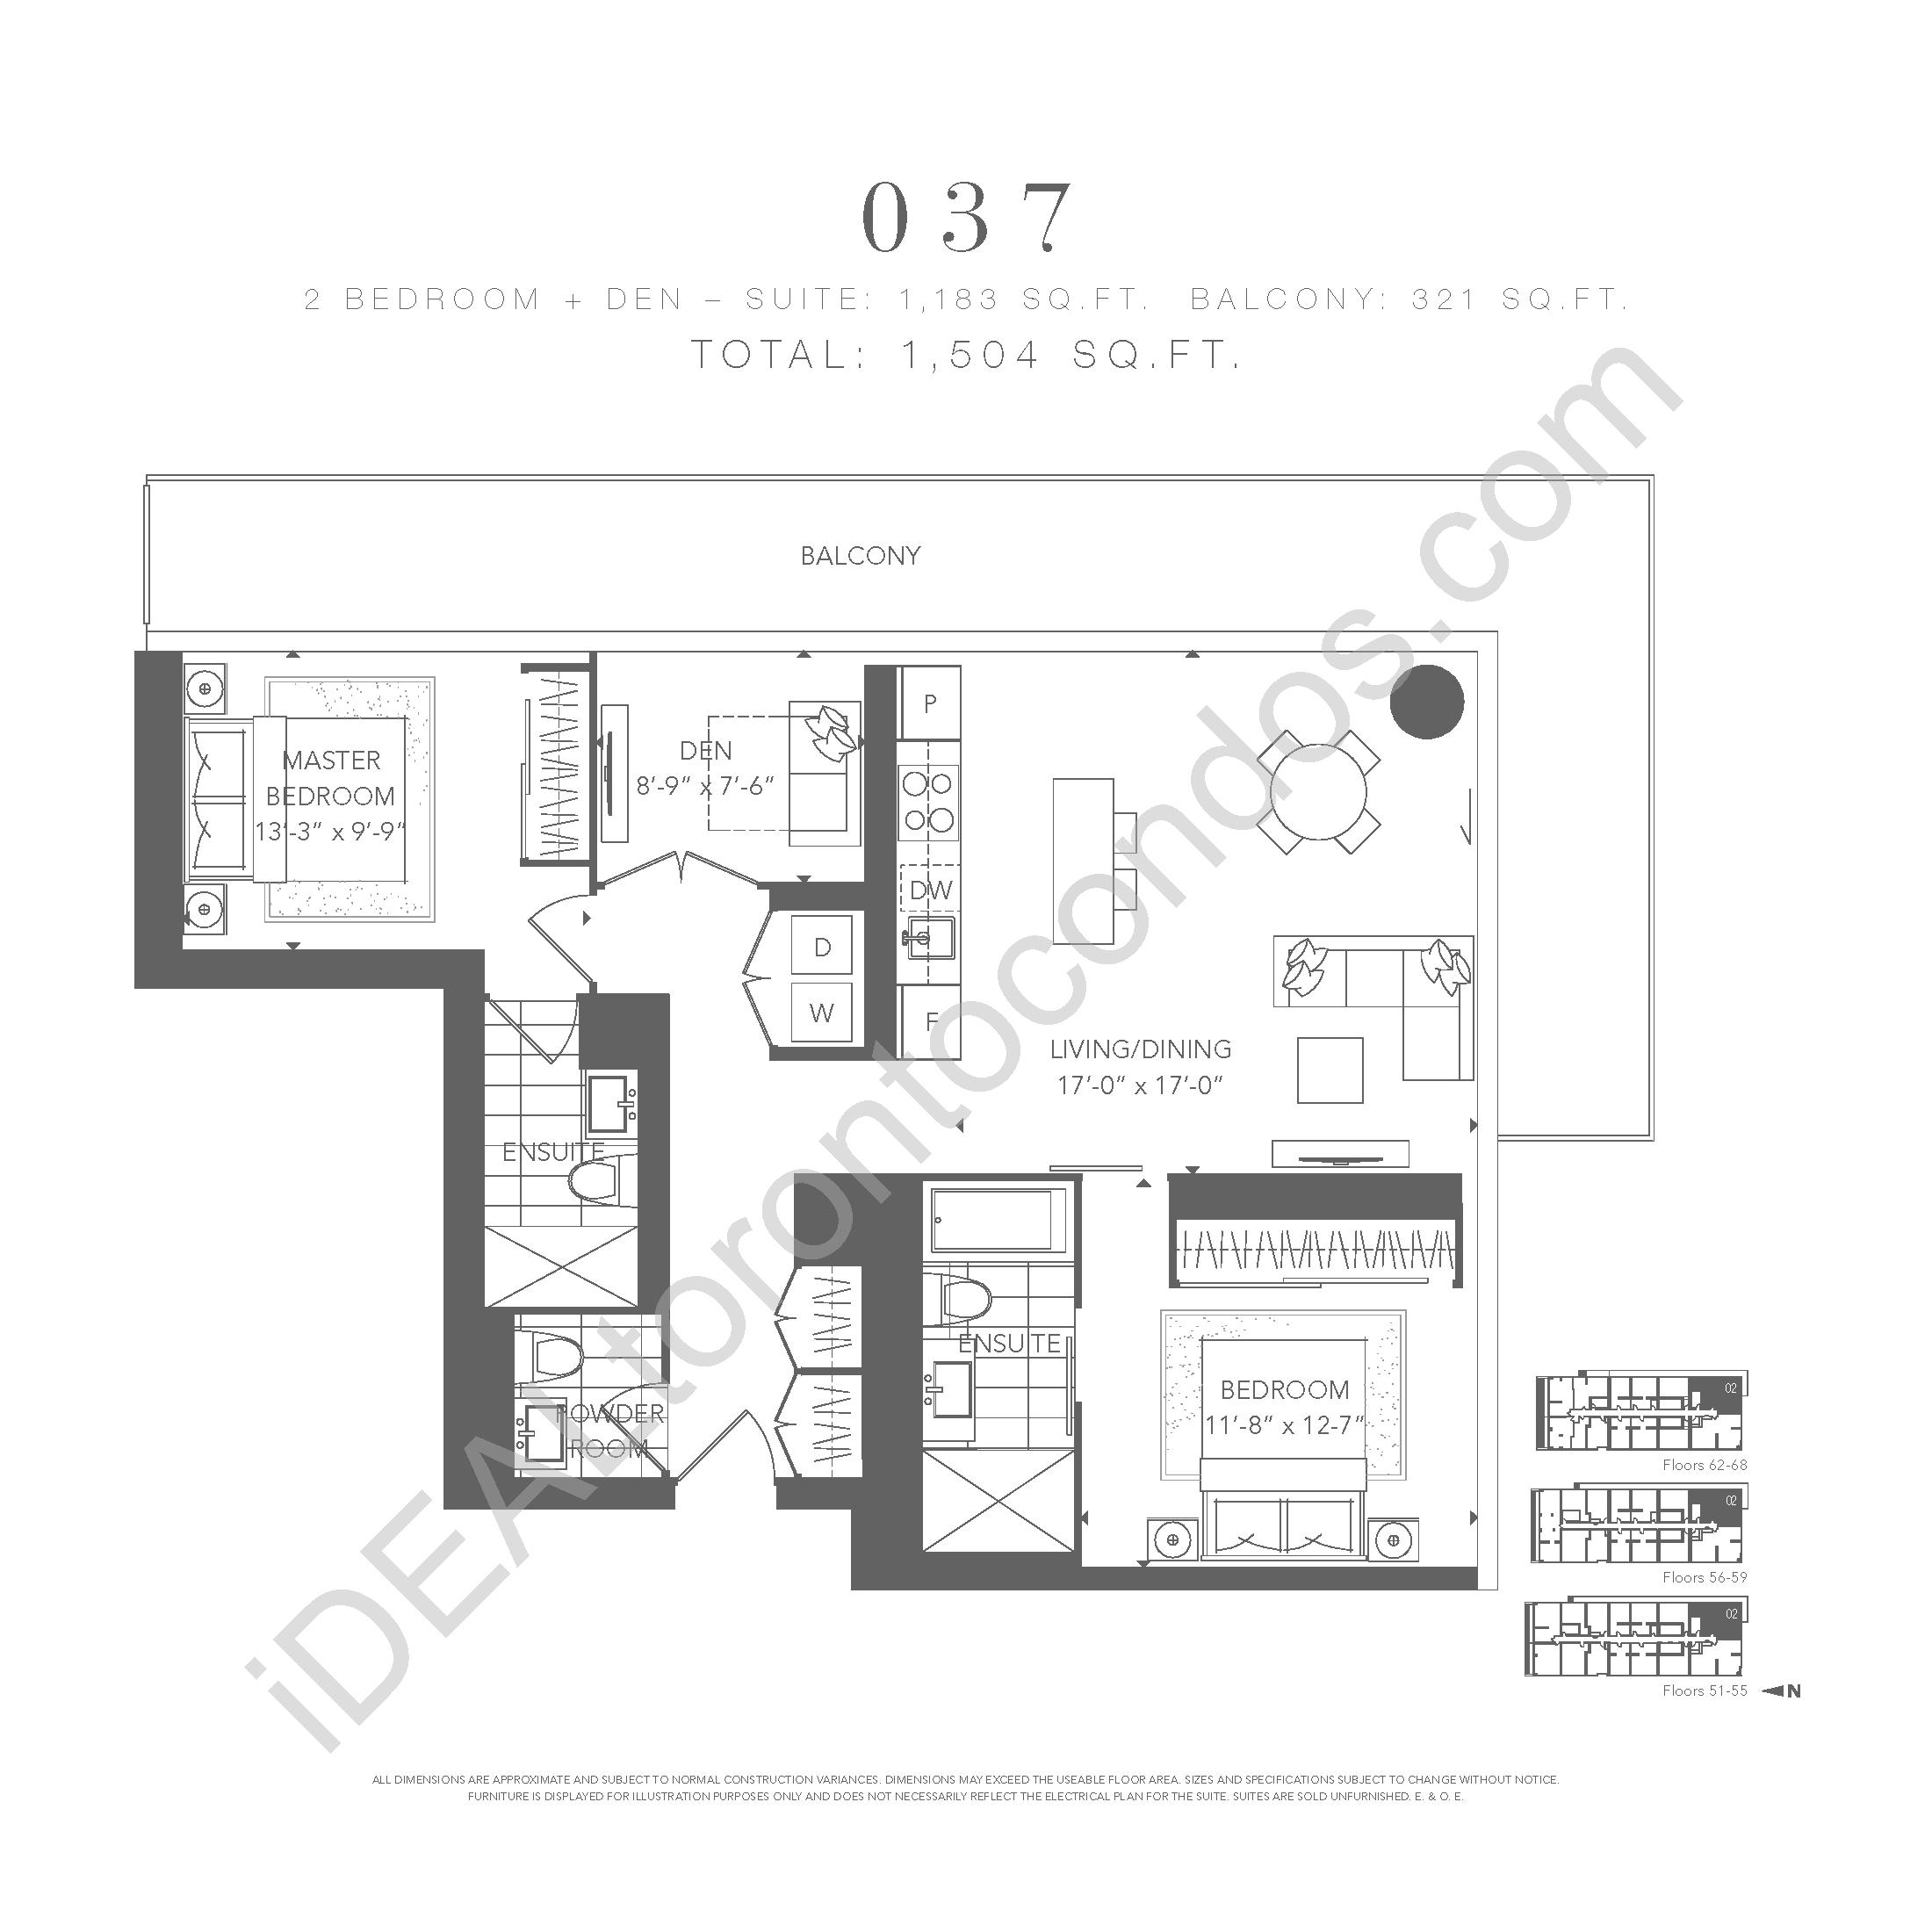 Ysl Residences 383 Yonge Street Toronto Idealtoronto Condos 2 Bedroom Electrical Plan Den 037